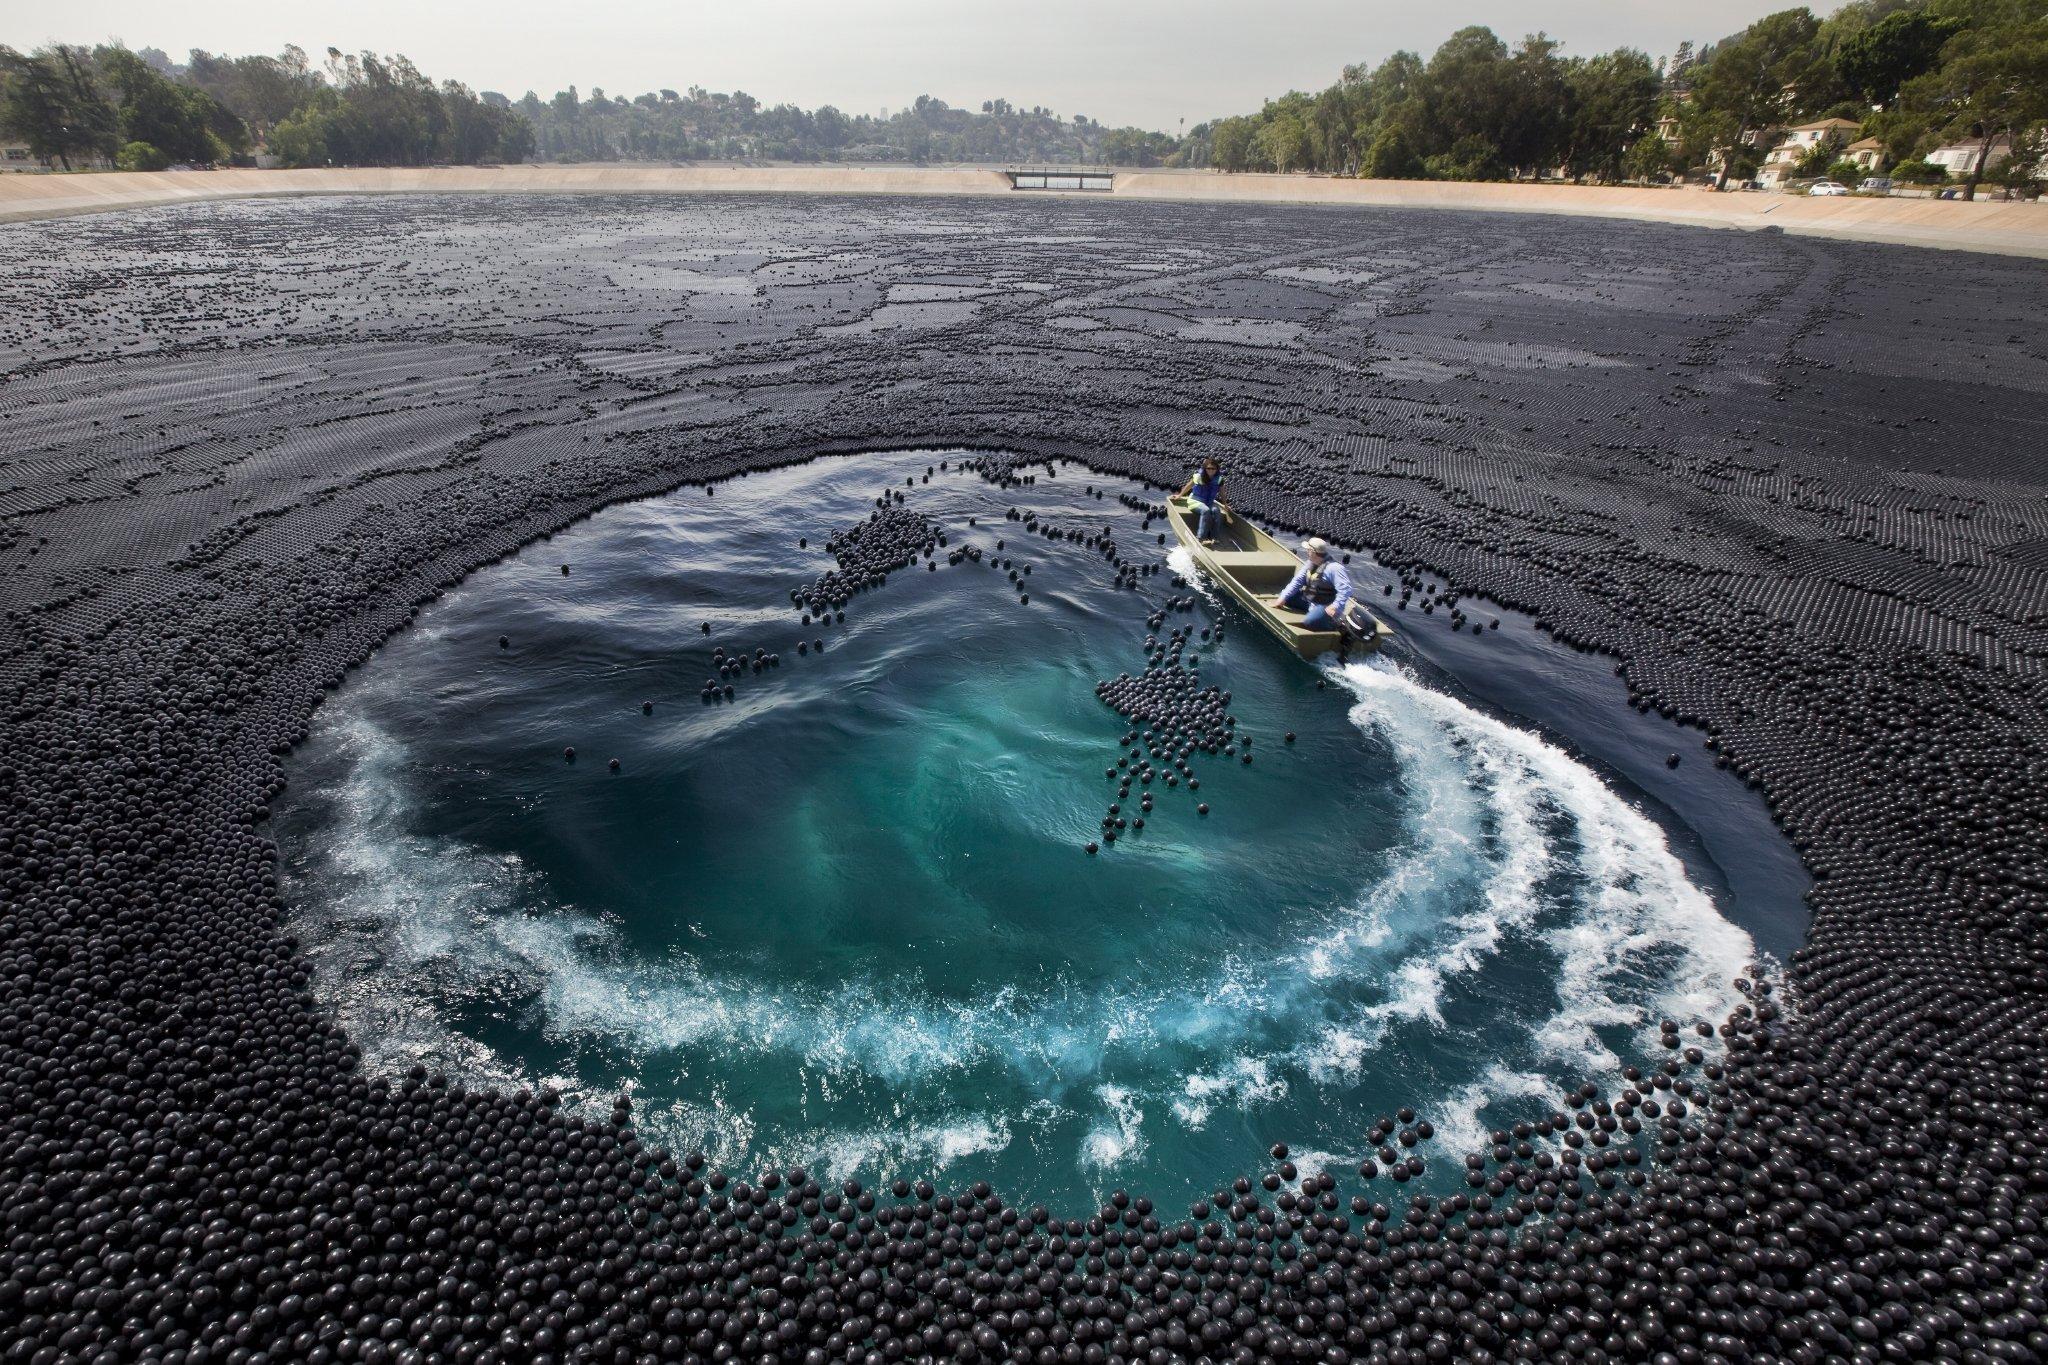 black shade balls covered